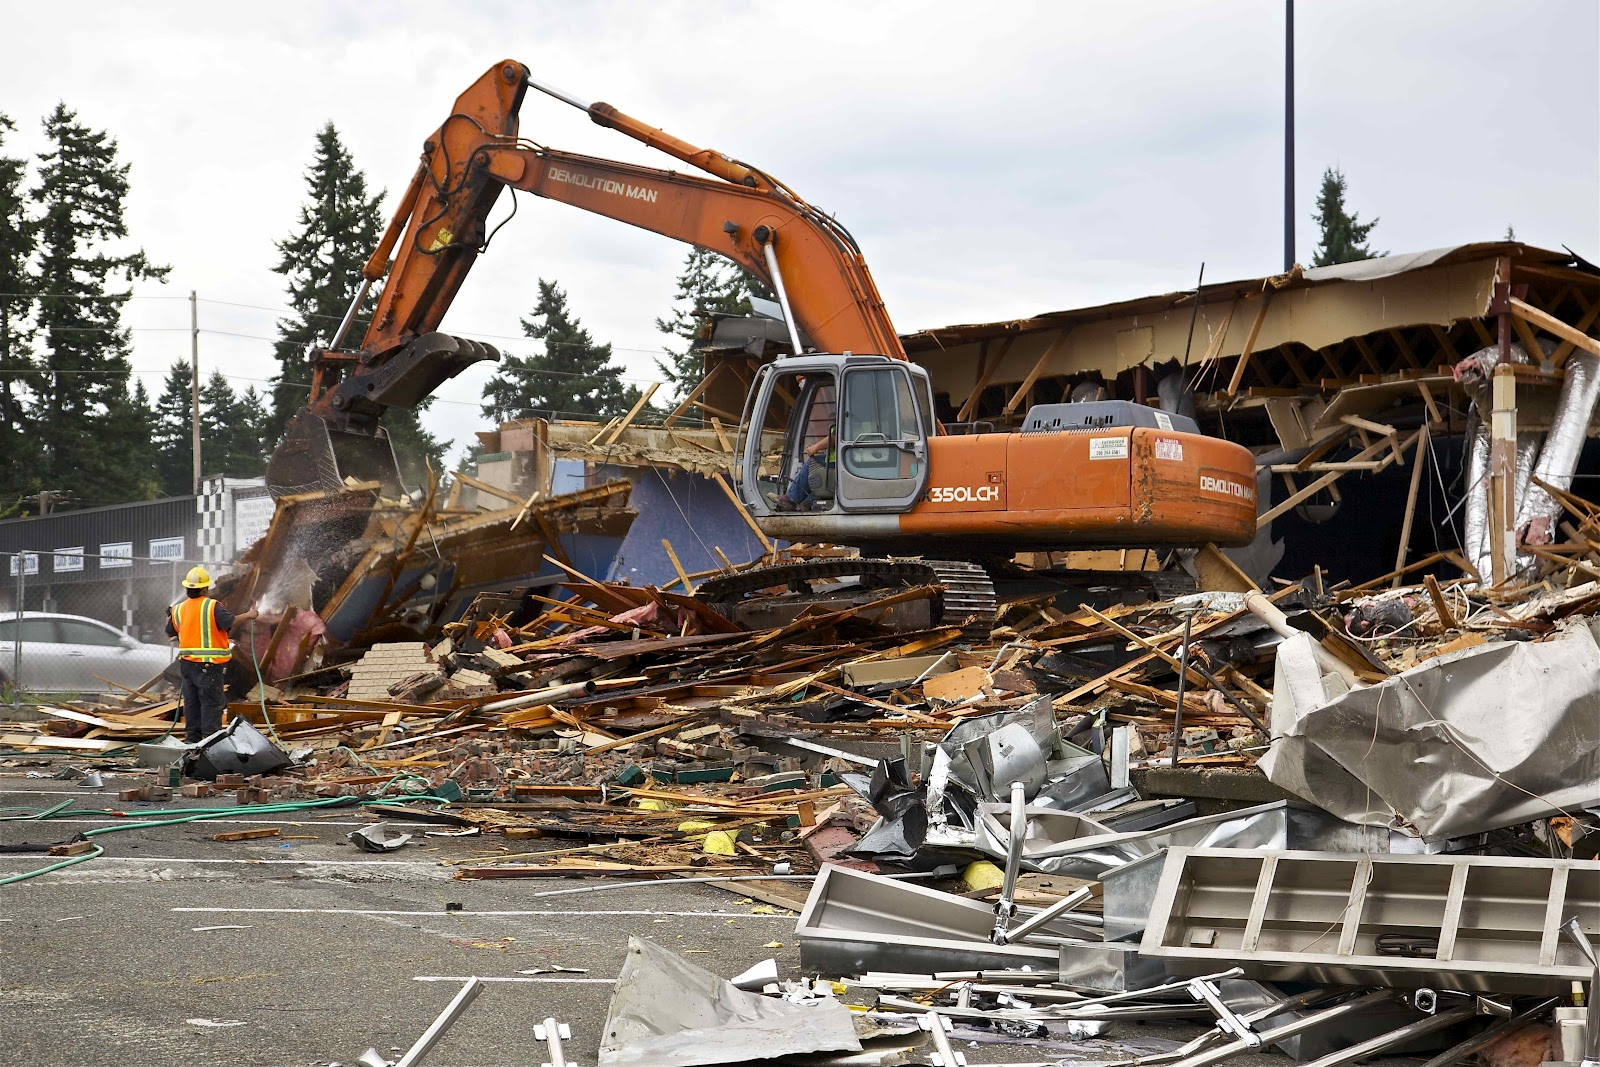 Shoreline Area News: ICHS Breaks Ground on Shoreline Medical